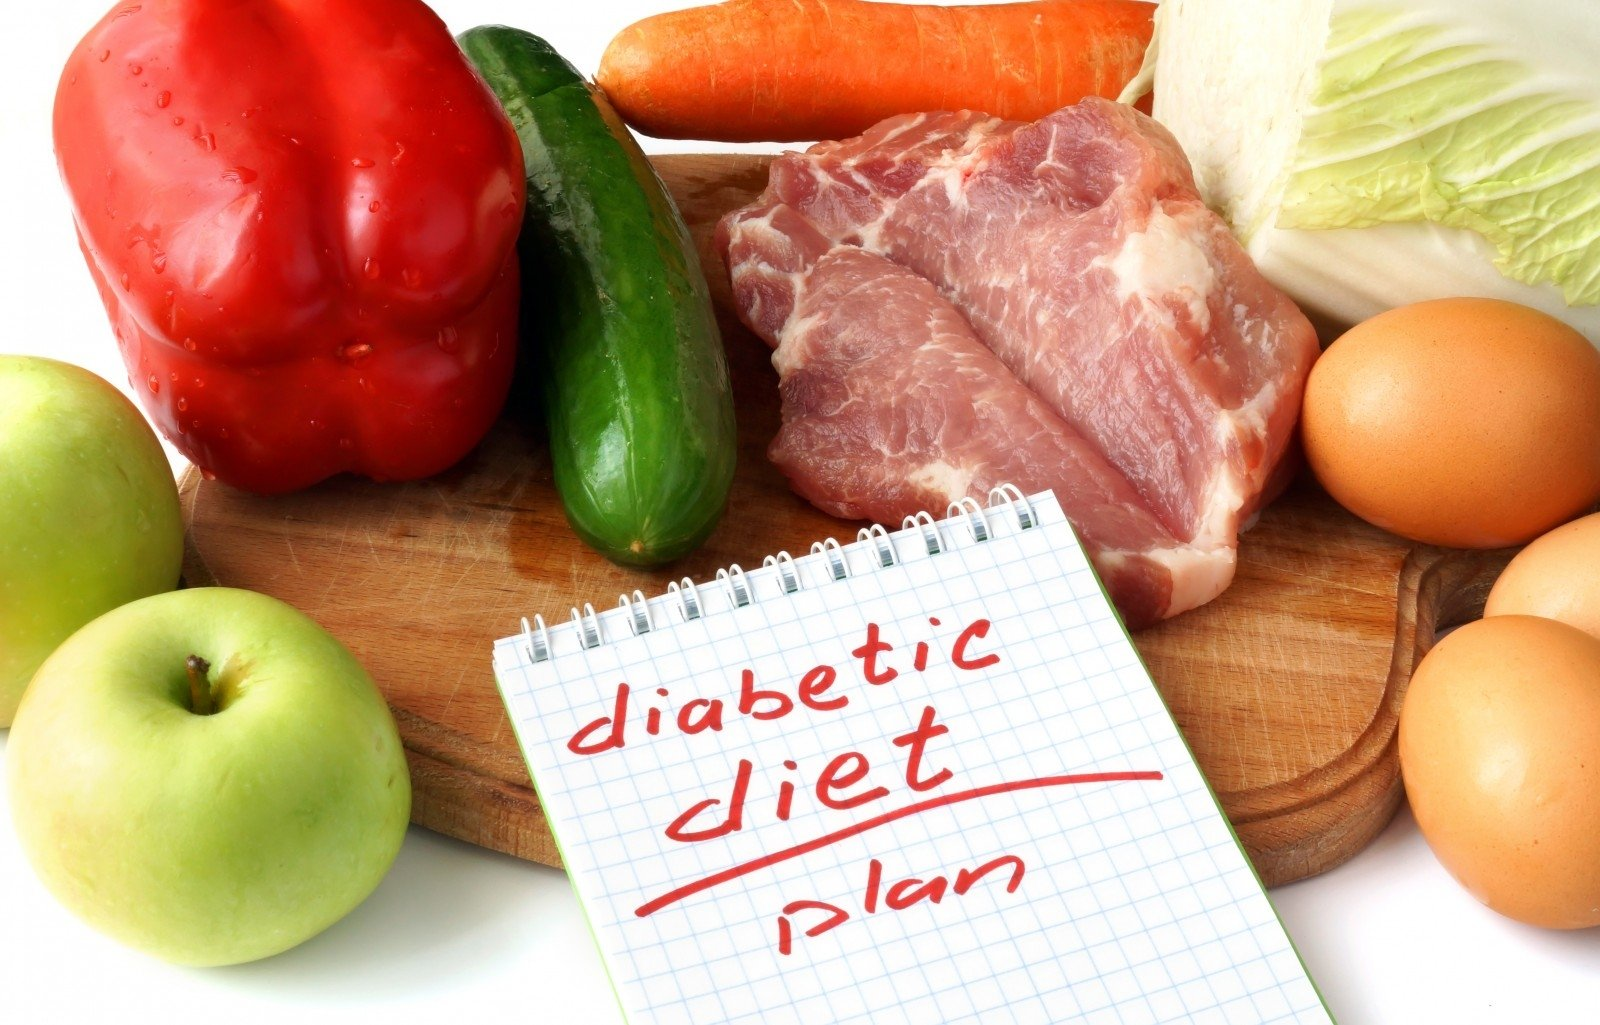 kokius maisto produktus galima vartoti sergant hipertenzija